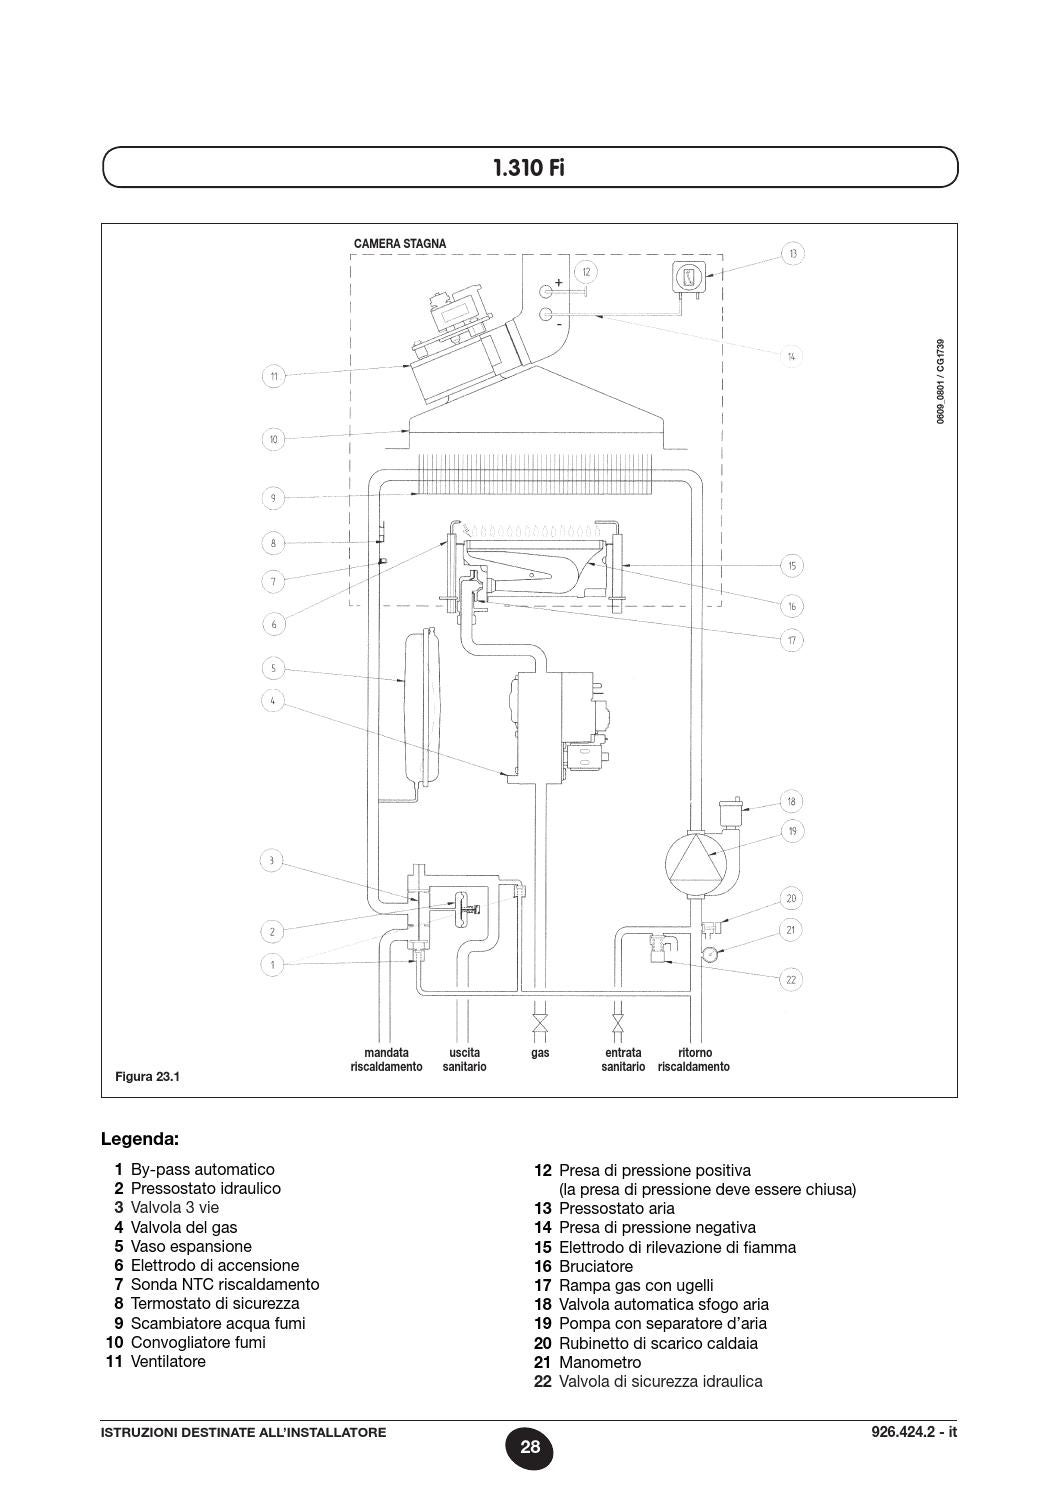 Manuale luna 3 baxi by baxi spa issuu for Baxi eco 3 manuale